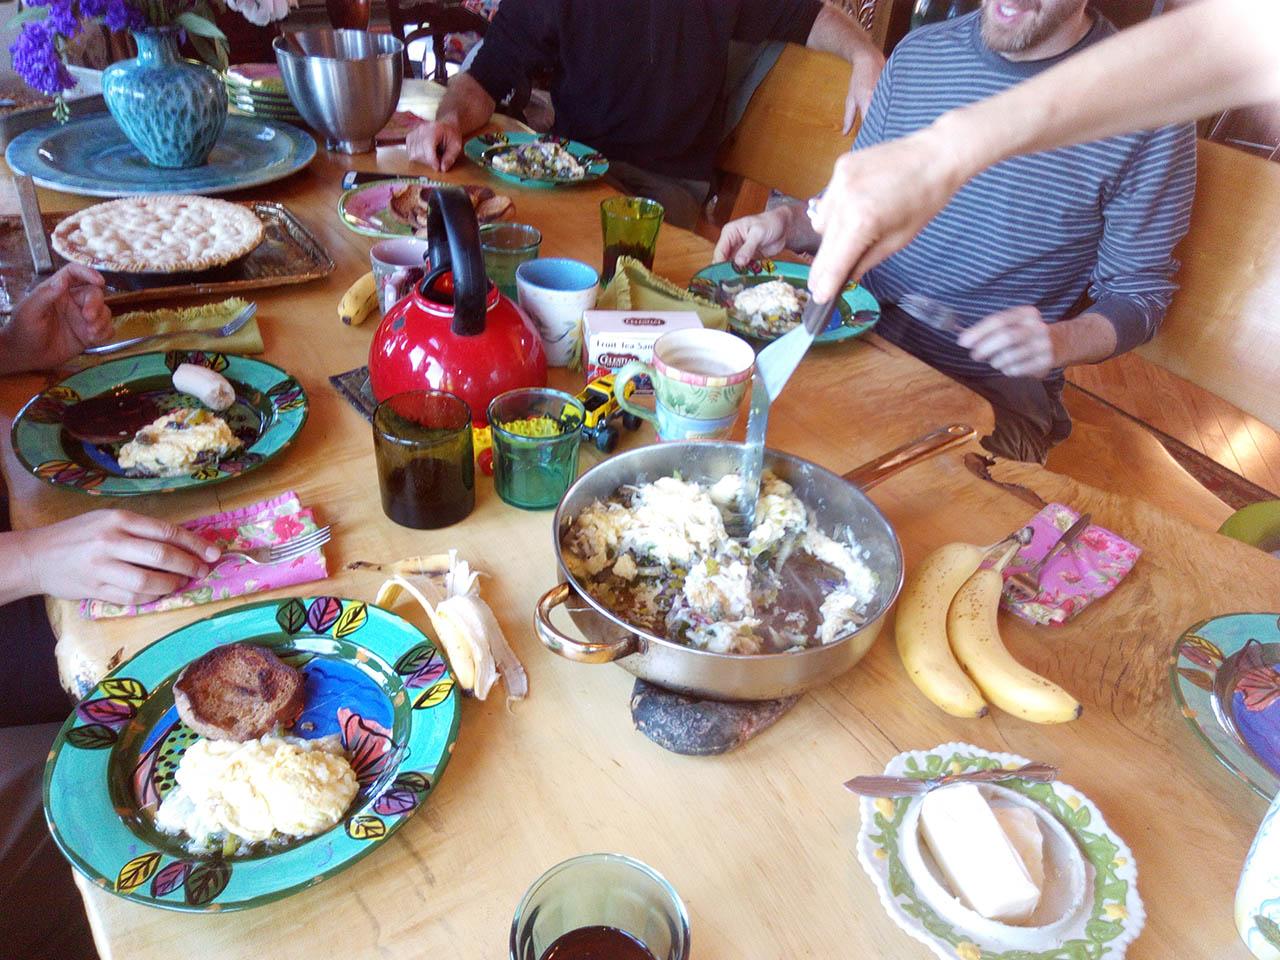 Group having breakfast.